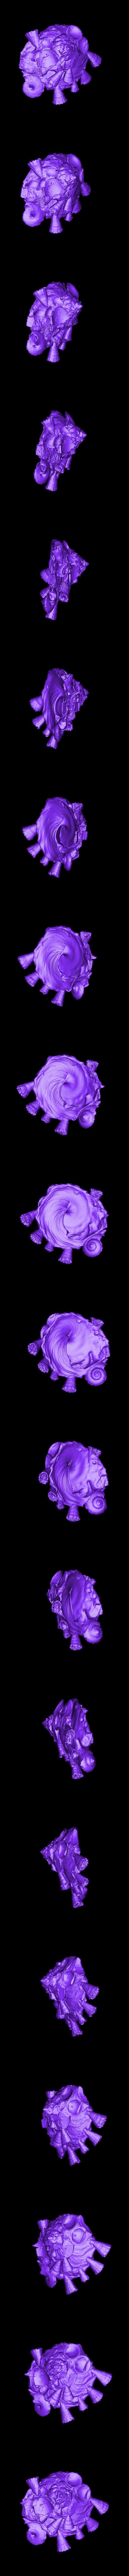 Xenophora.obj Download free OBJ file Xenophora • 3D printable design, ThreeDScans